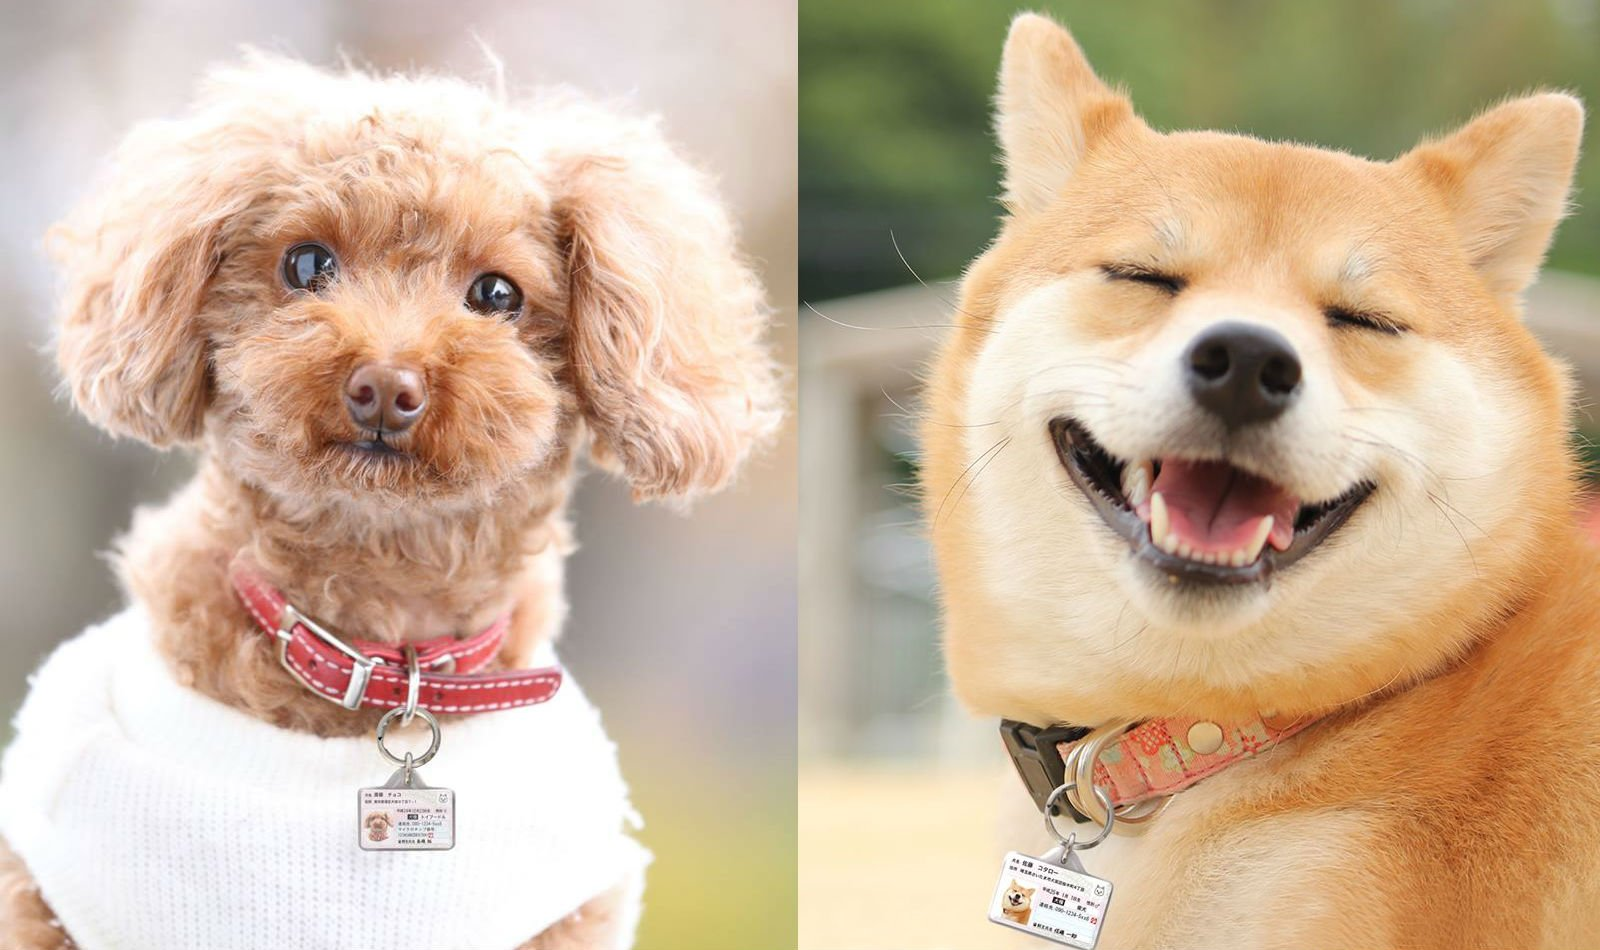 wwwgougou_毛小孩就是我的家人!日本狗狗身分證貼心上市   狗狗、身分證 ...